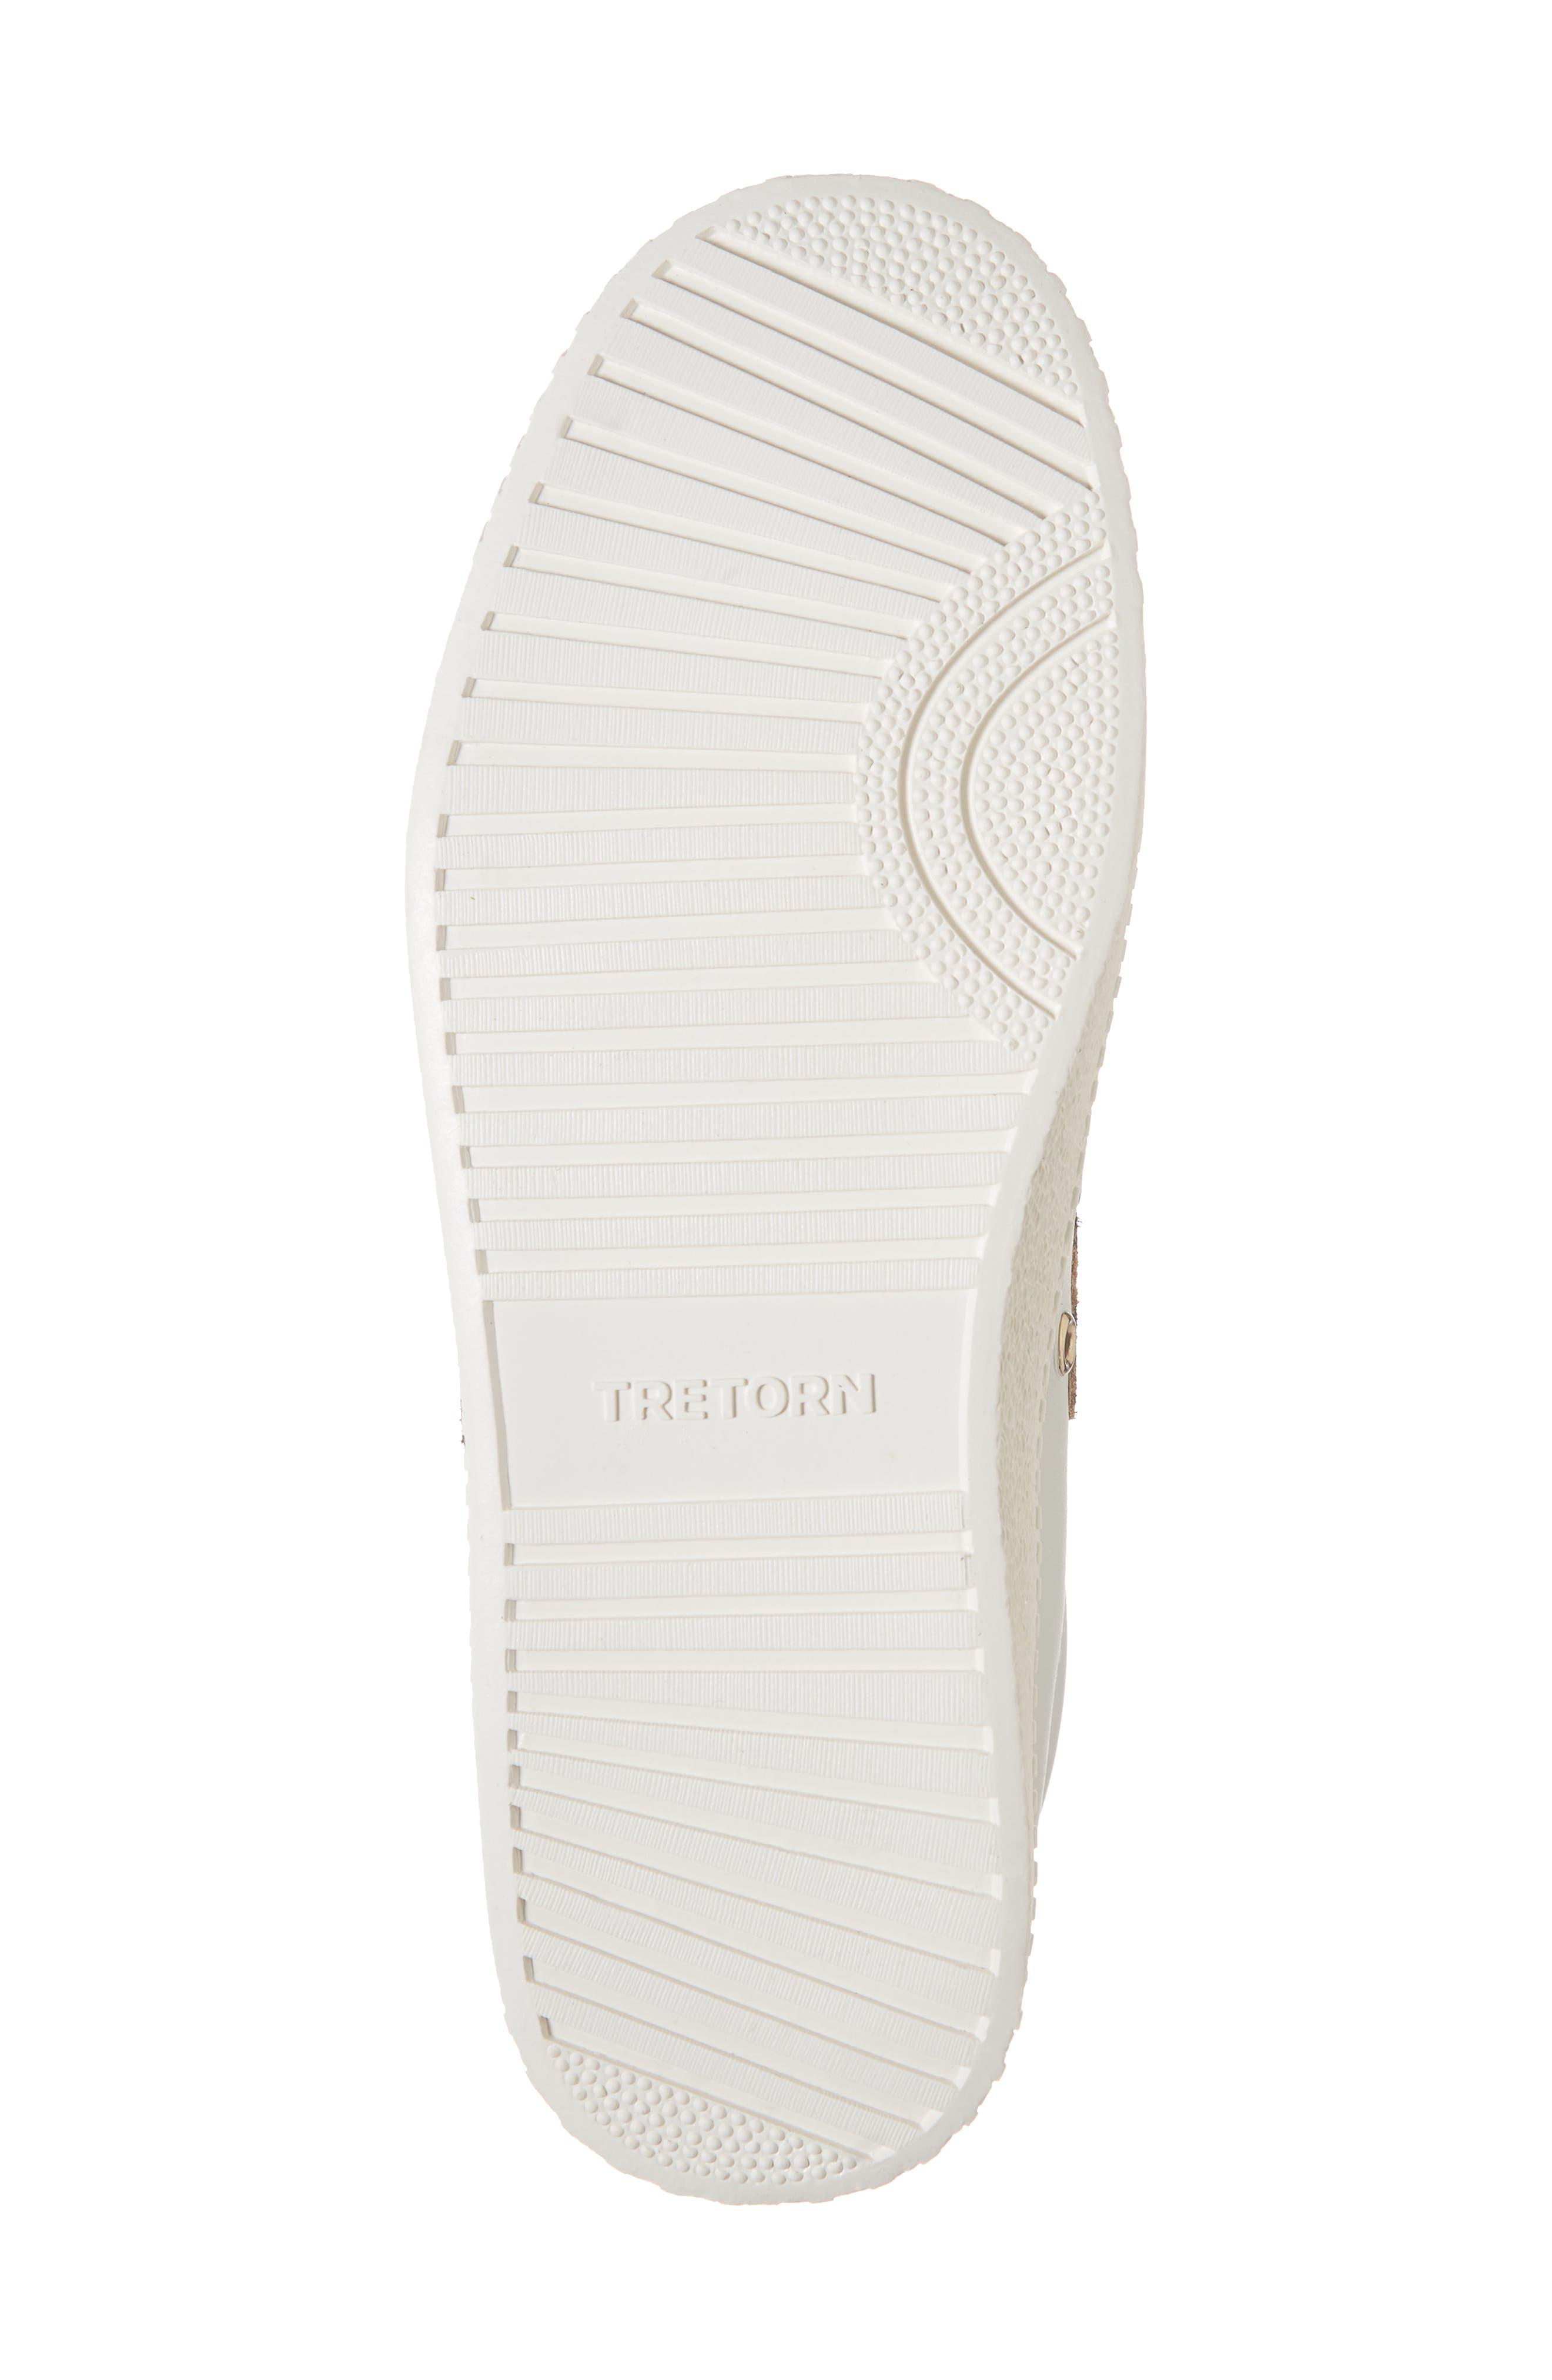 Patterned Sneaker,                             Alternate thumbnail 3, color,                             Vintage White/ Tan Multi